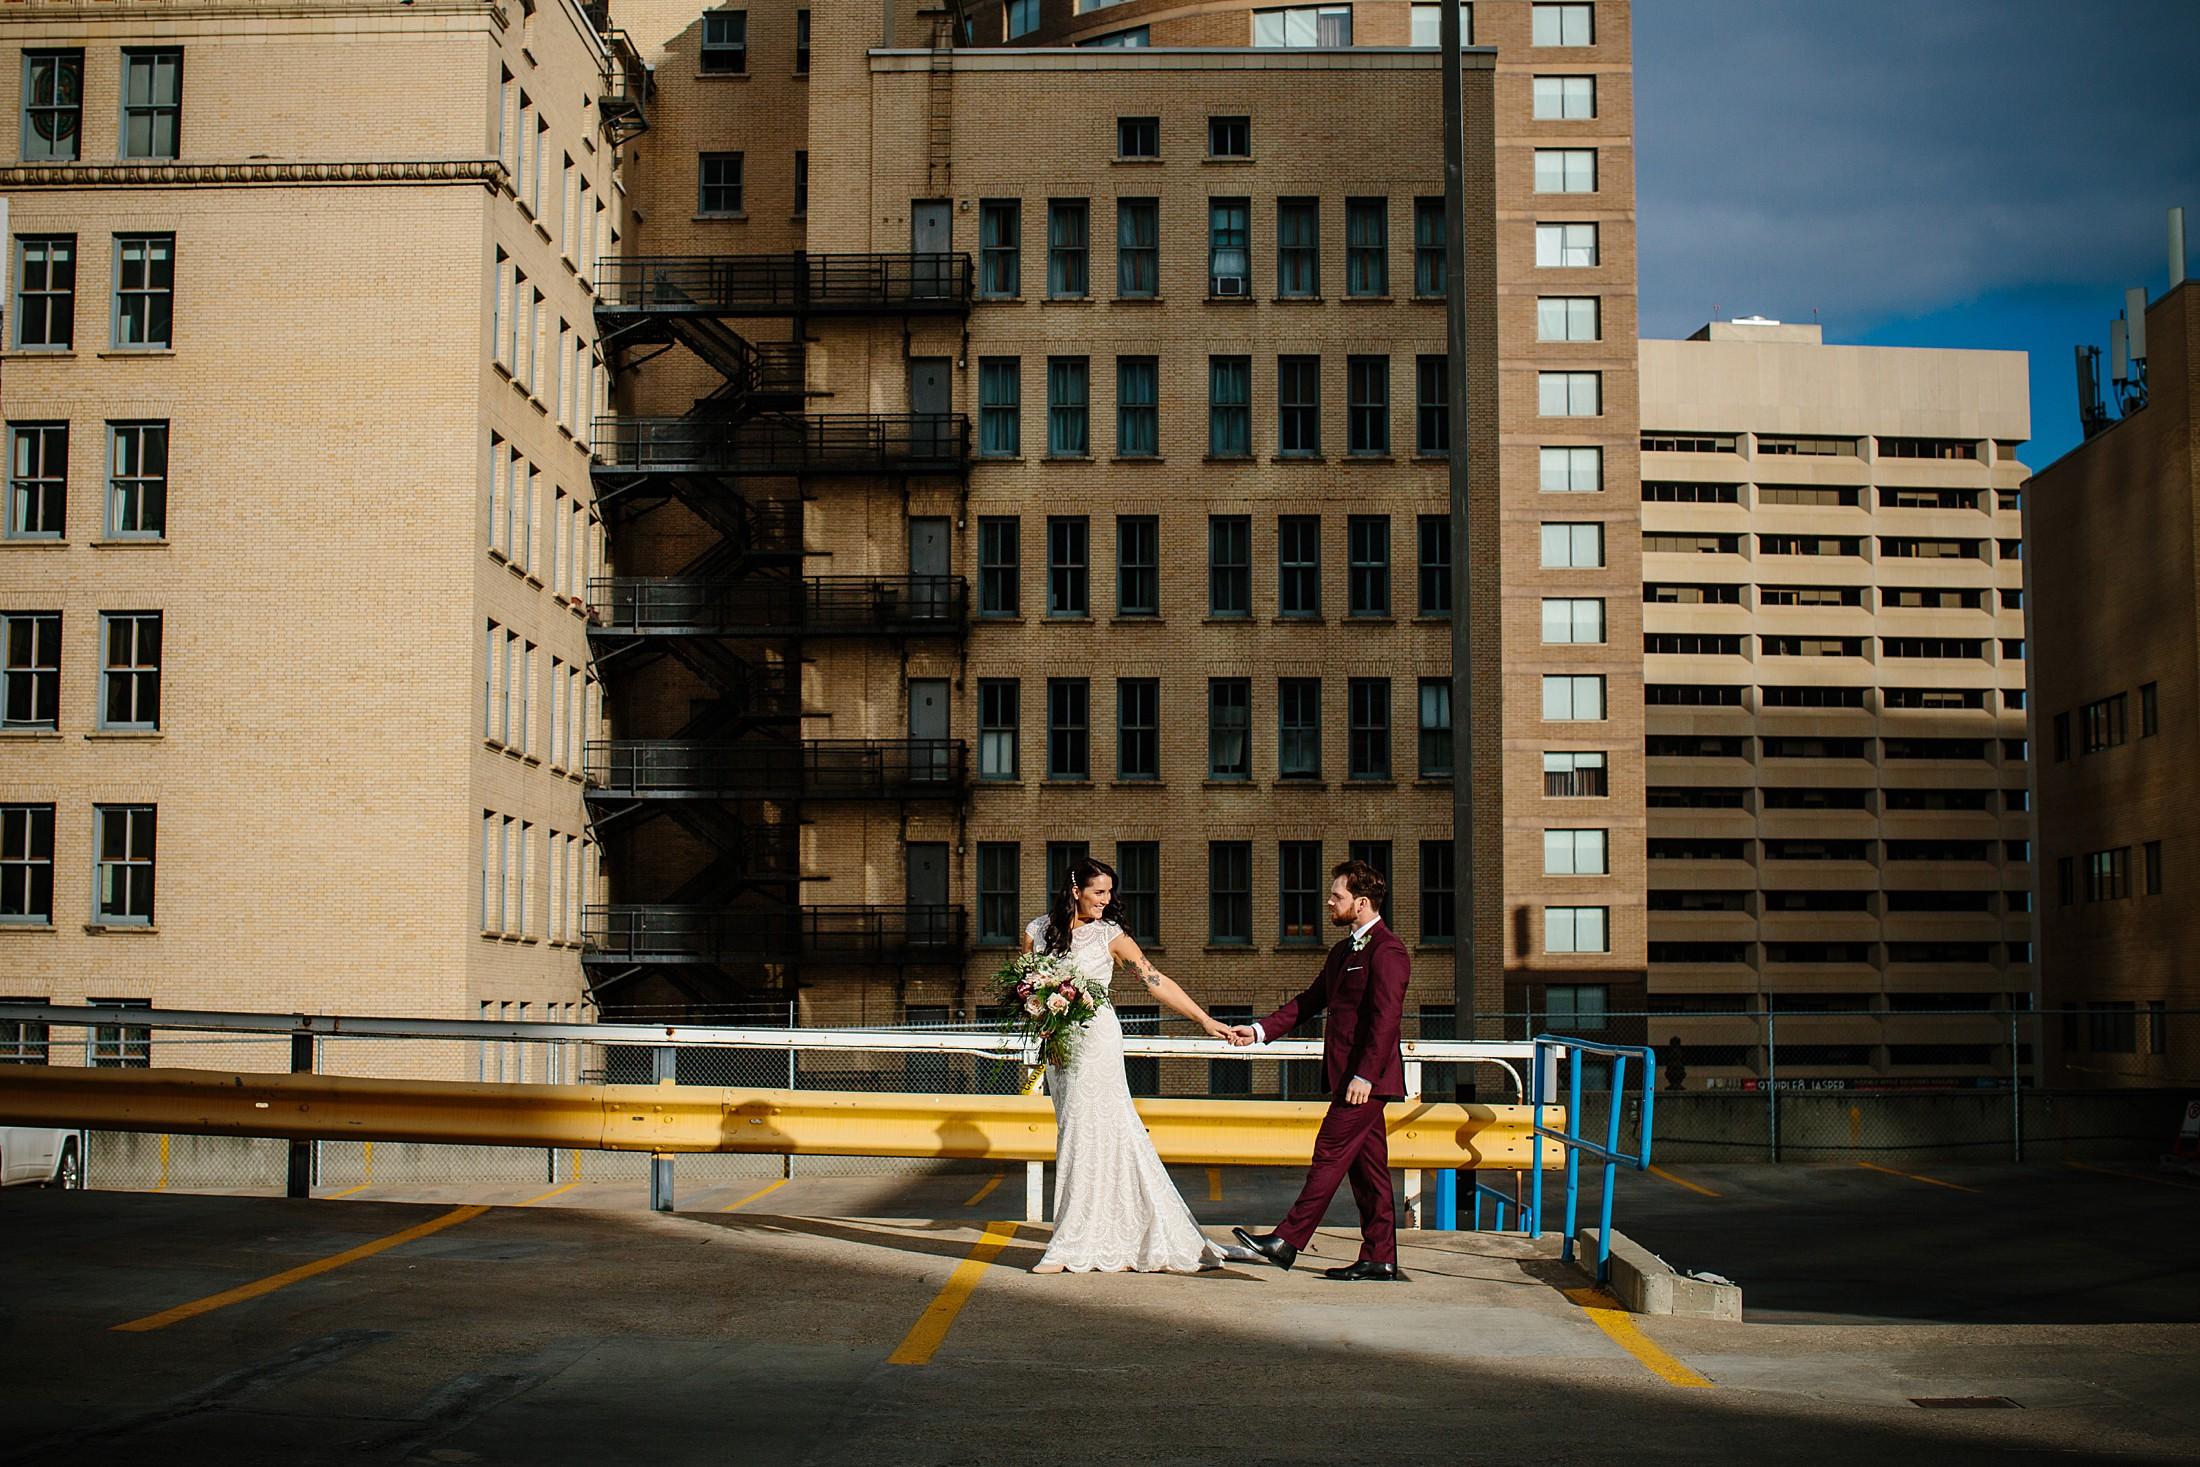 _M2A0674_Note Photography Documentary Photographer Wedding Photos Vancouver B.C. Best of 2018 2019 2020 Vancouver Island Okanagan Banff Edmonton Victoria.jpg